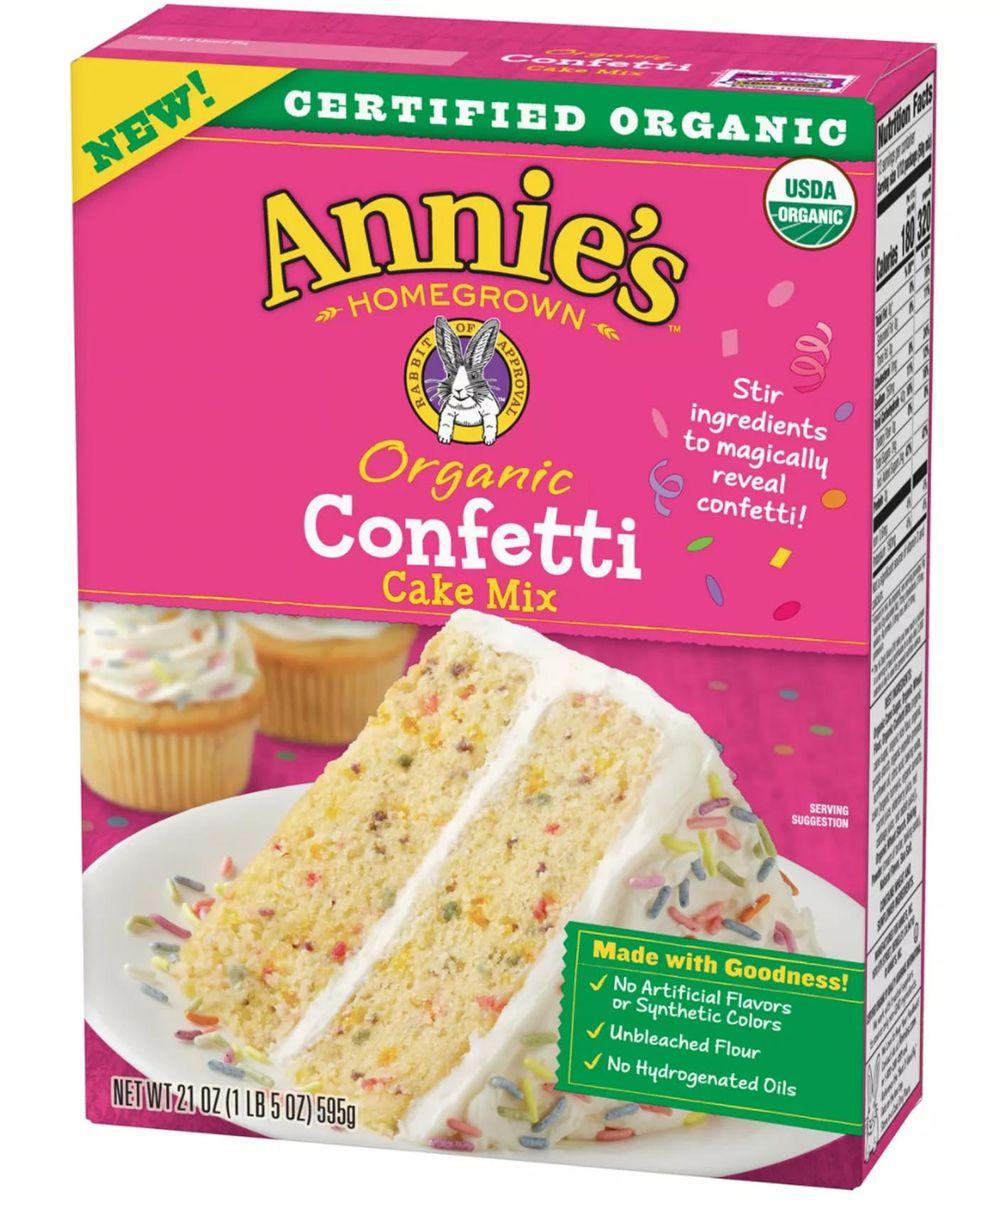 Annies organic confetti cake mix